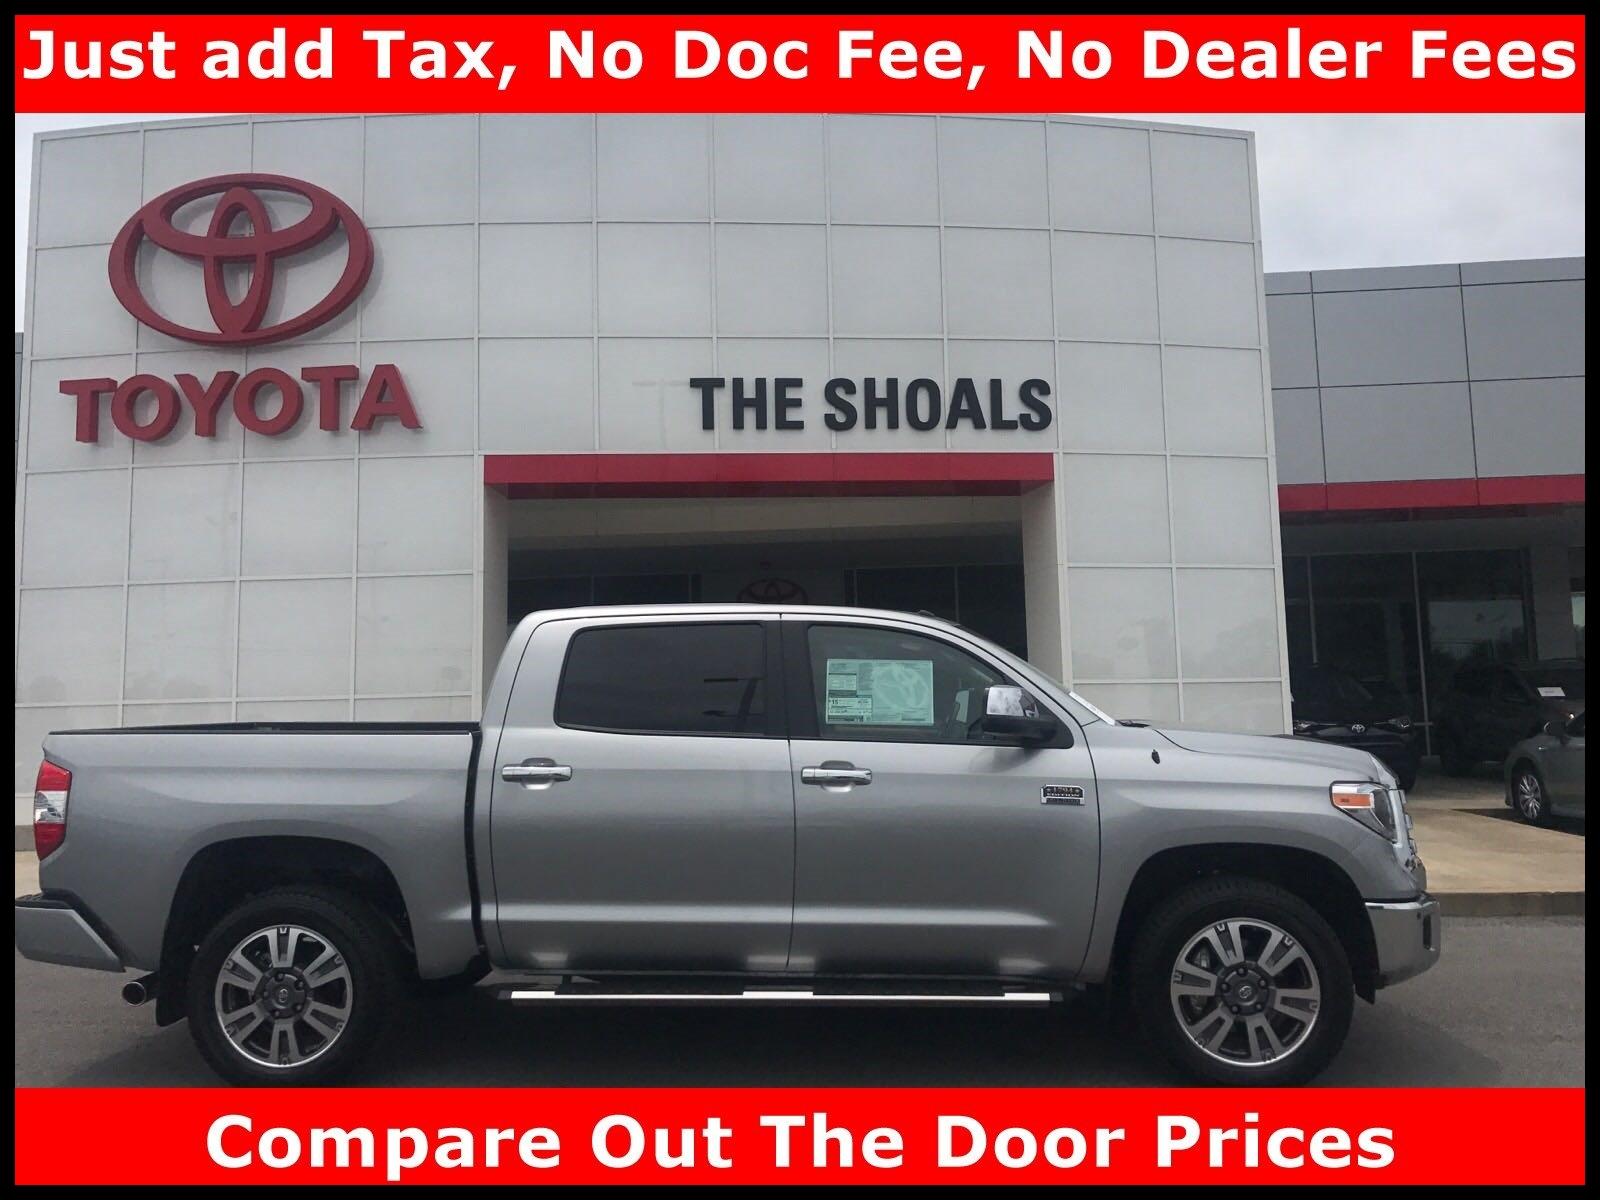 New 2018 Toyota Tundra 4WD 1794 Edition